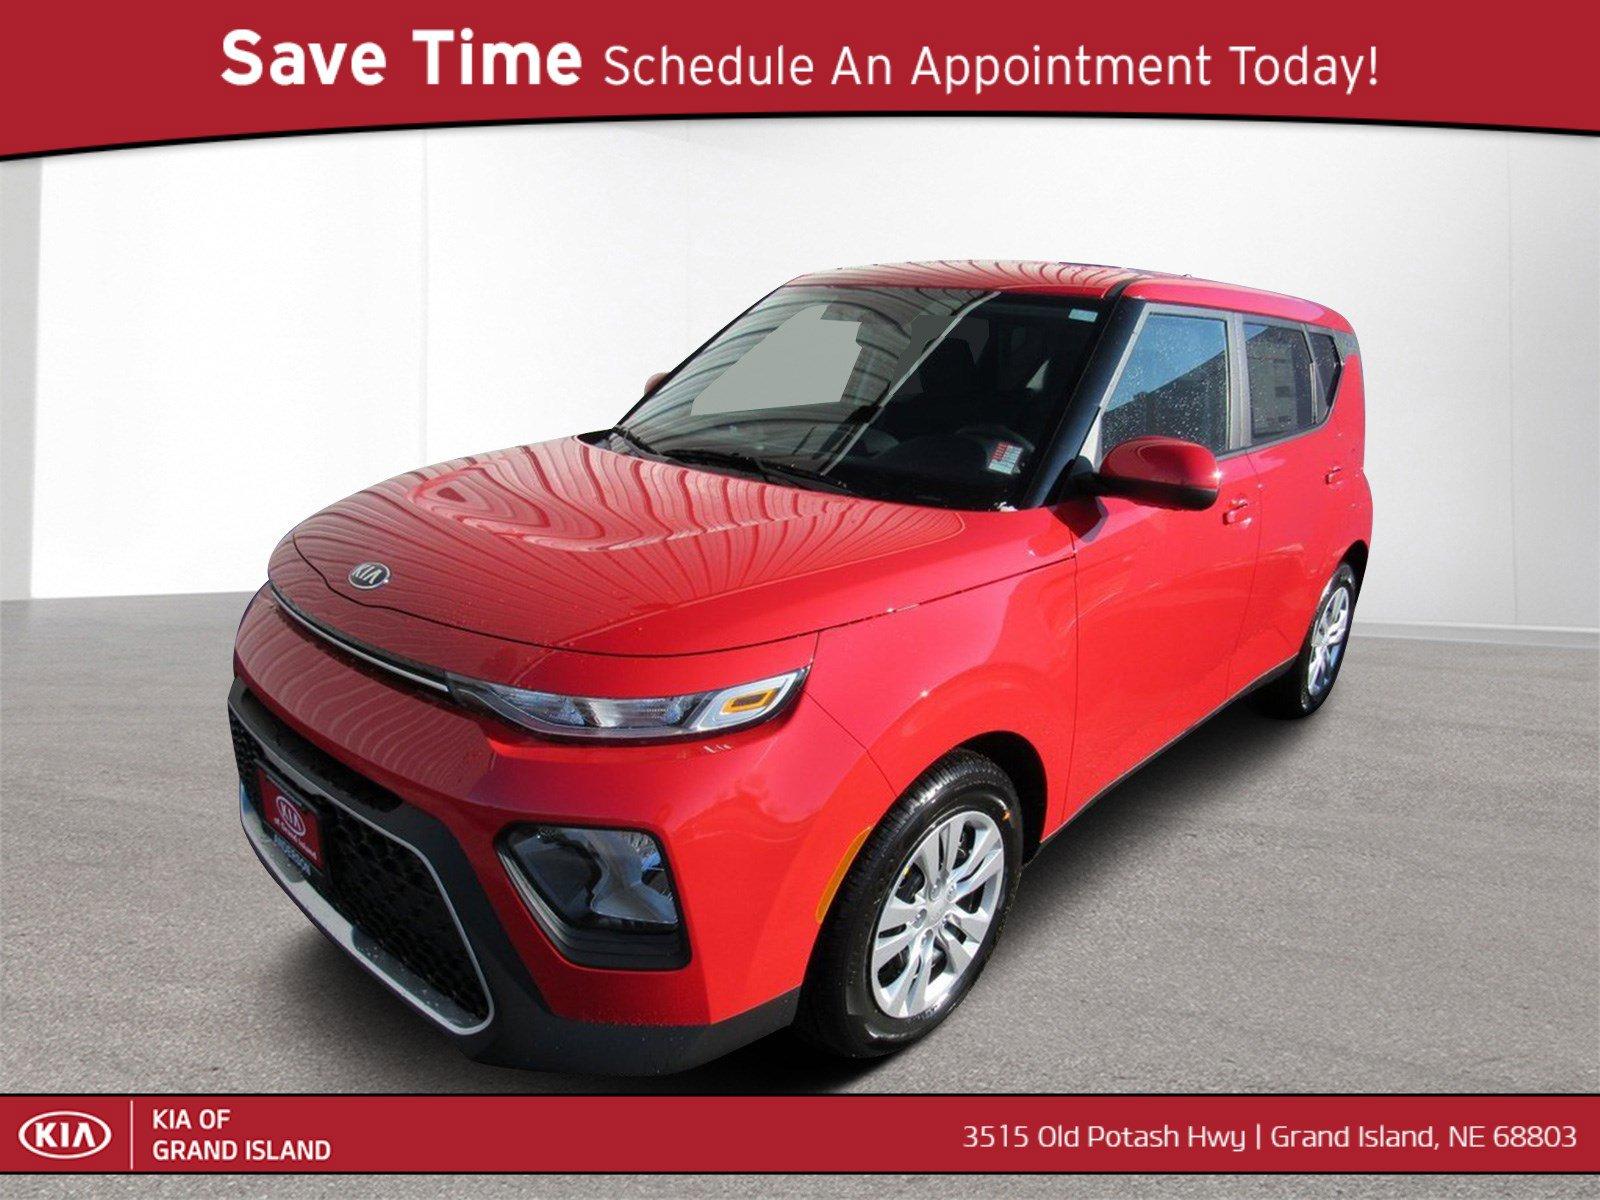 New 2020 Kia Soul LX 4D Hatchback for sale in Grand Island NE